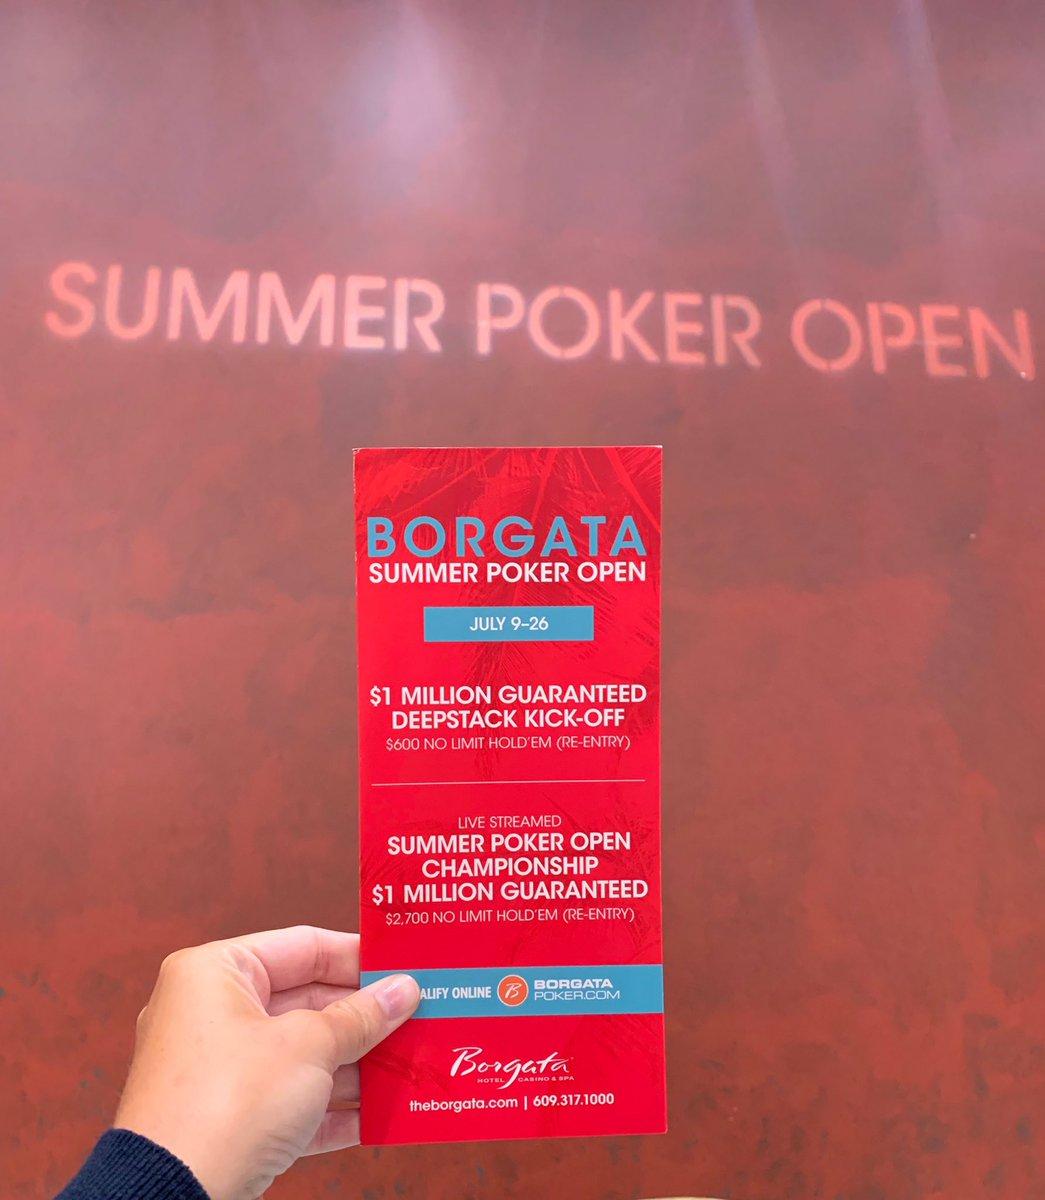 Summer Poker Open starts NOW! summerpokeropen.blog.theborgata.com